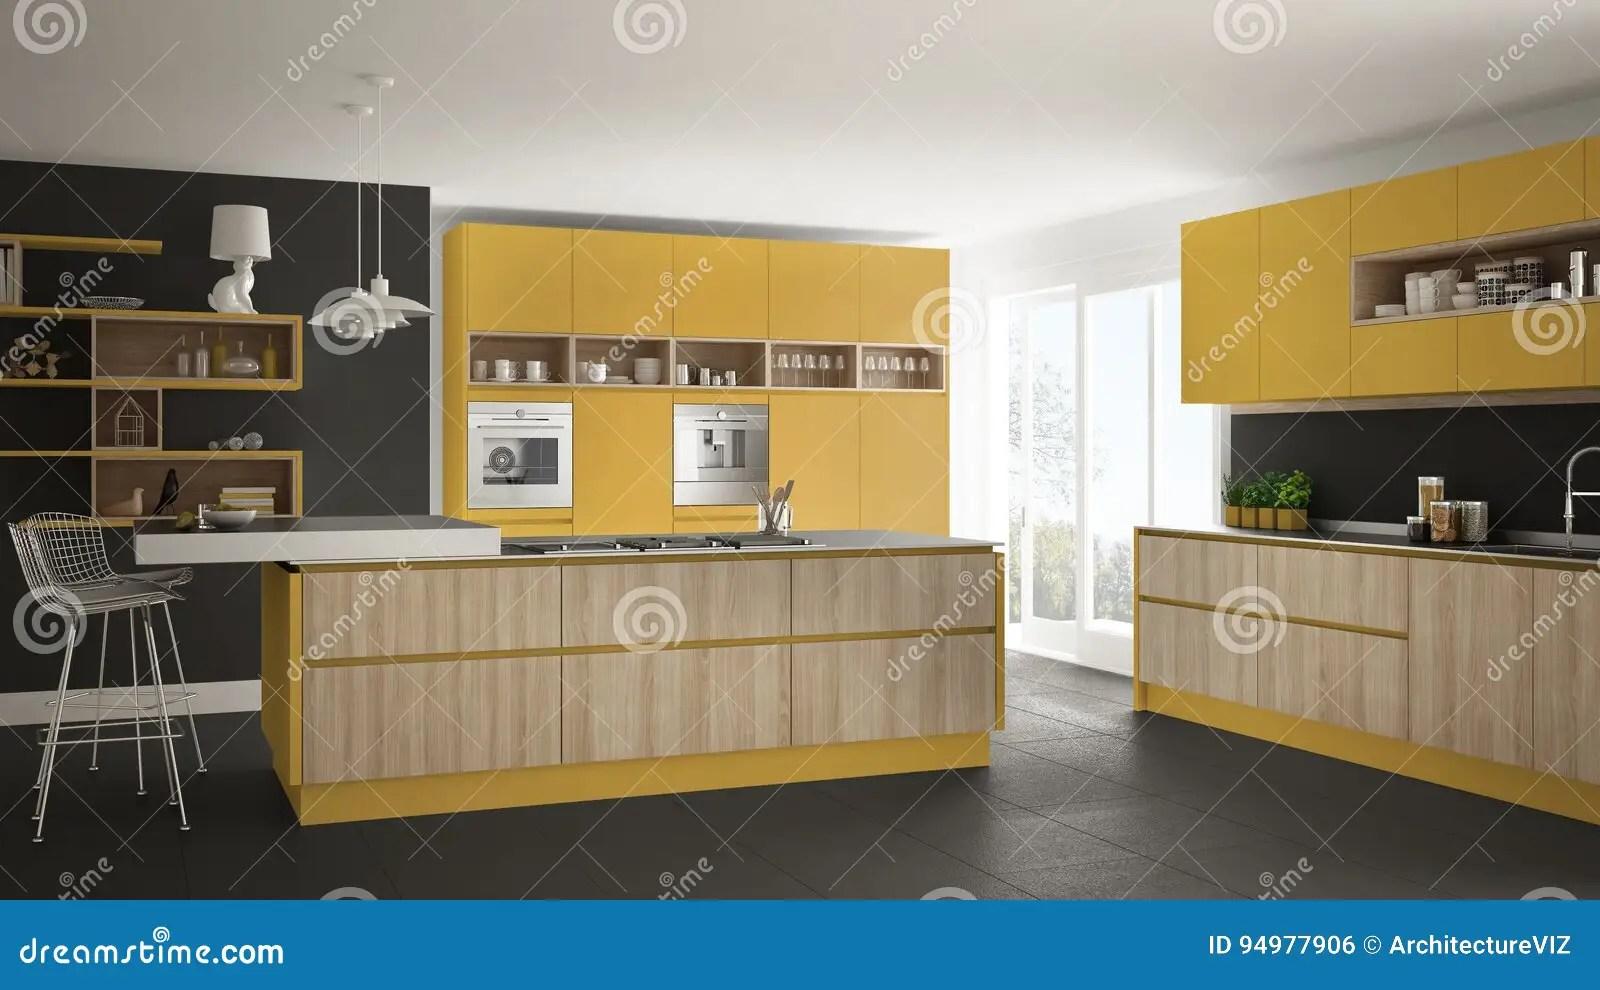 kitchen console table lights over island 有木和黄色细节的 minimalisti现代白色厨房库存例证 插画包括有控制台 minimalistic室内设计现代白色厨房